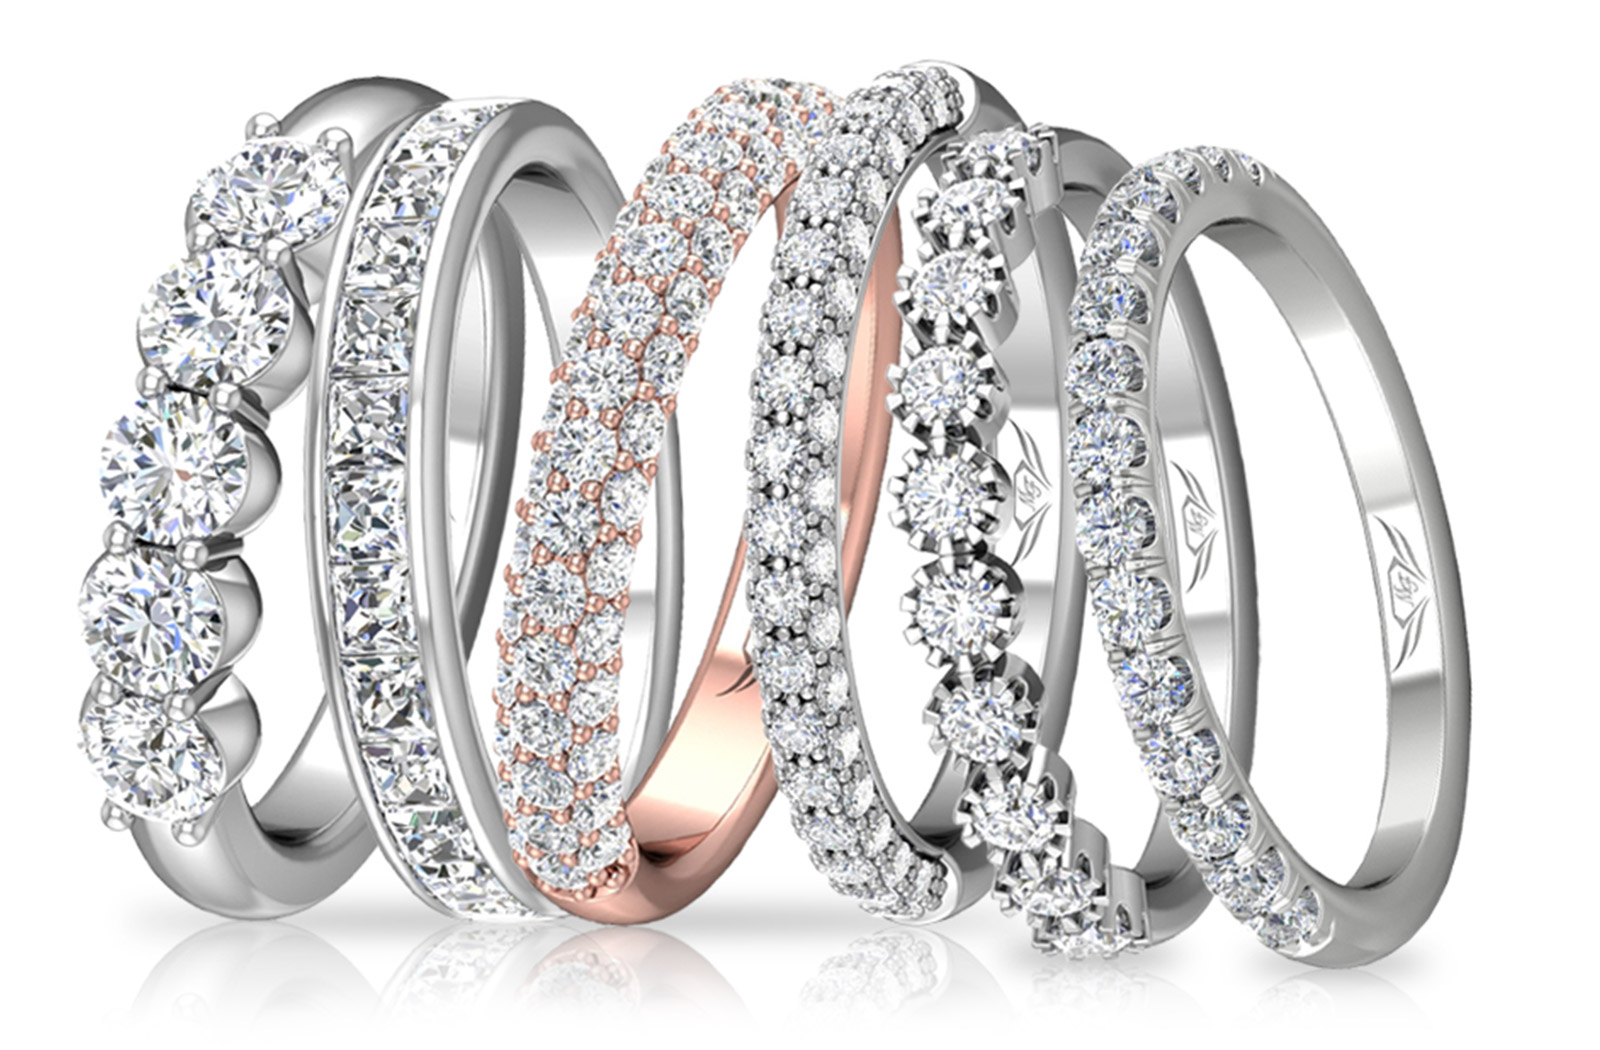 Anniversary Rings Dallas Texas Custom Diamond Rings Dallas, Shira Diamonds